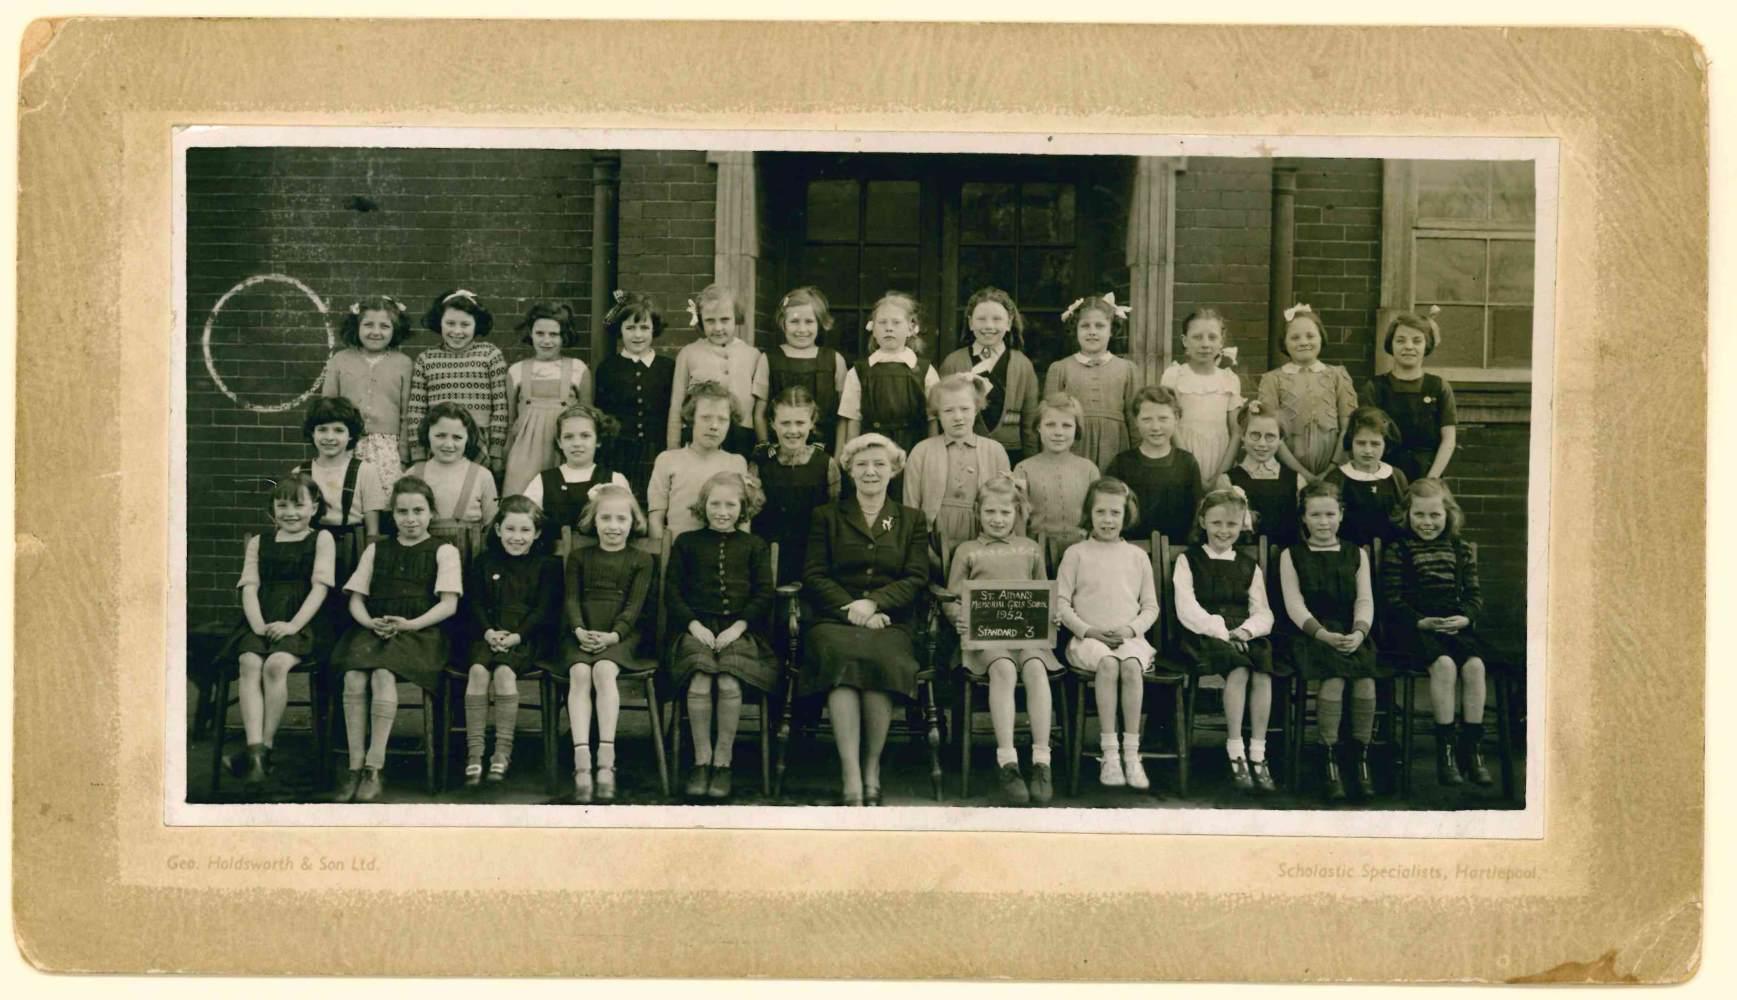 St Aidans CE Primary School - The 1970s